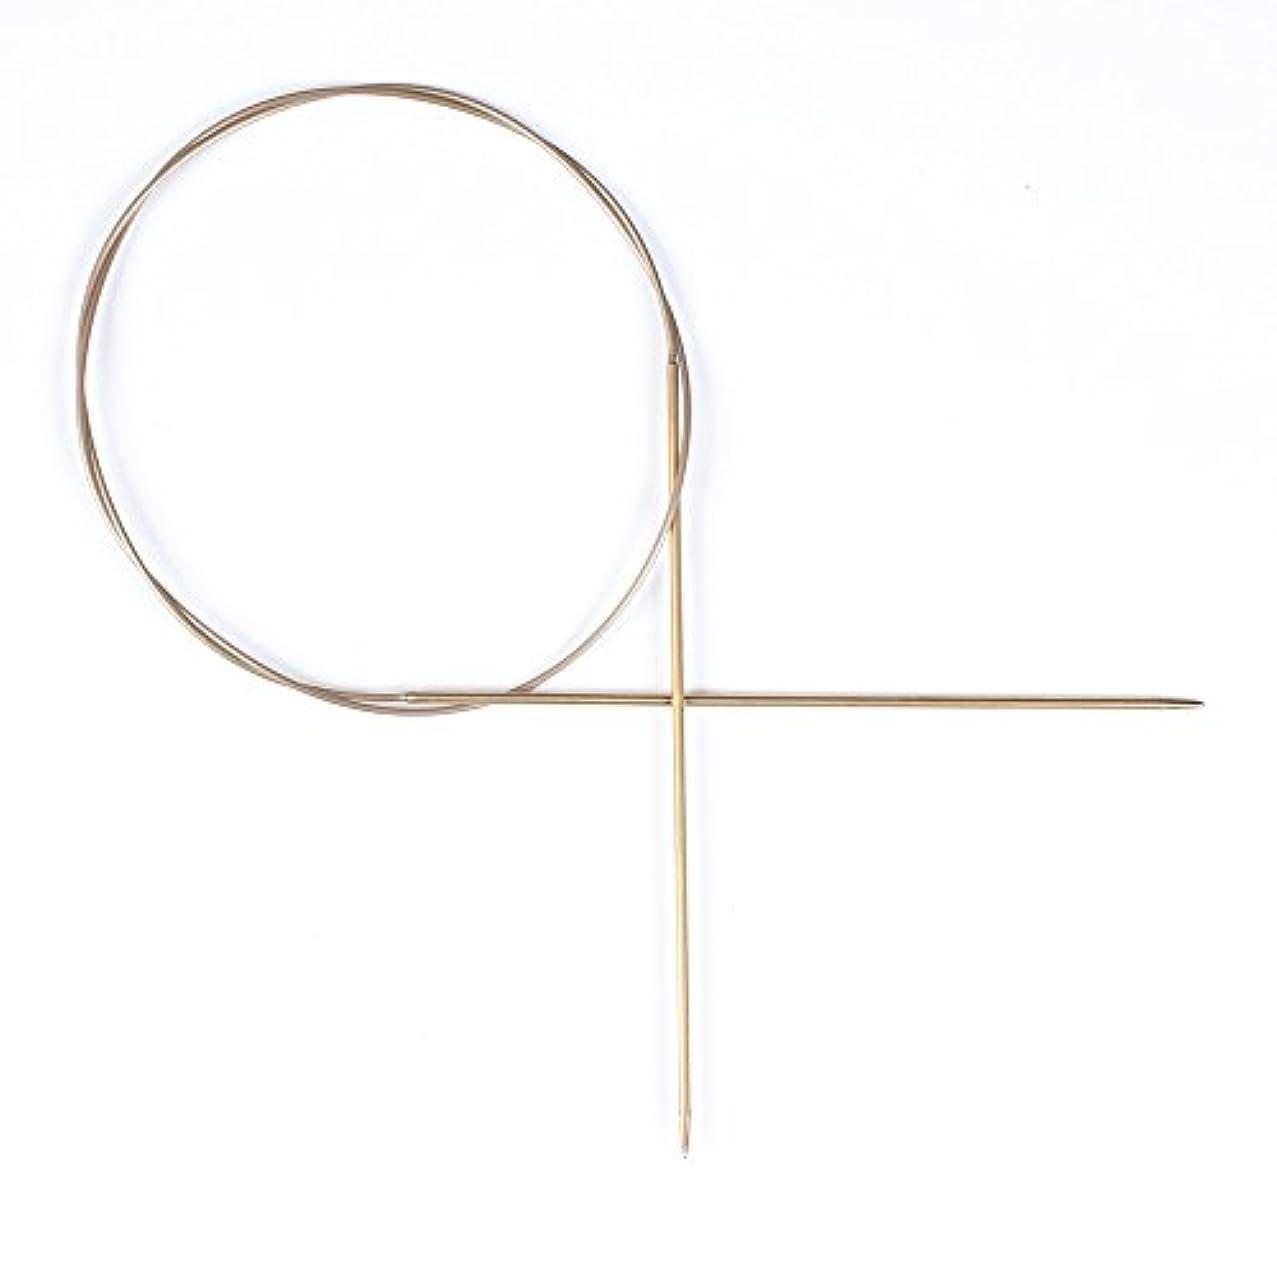 Addi Turbo Lace 32 (80 cm) Circular Knitting Needles (2.25mm)